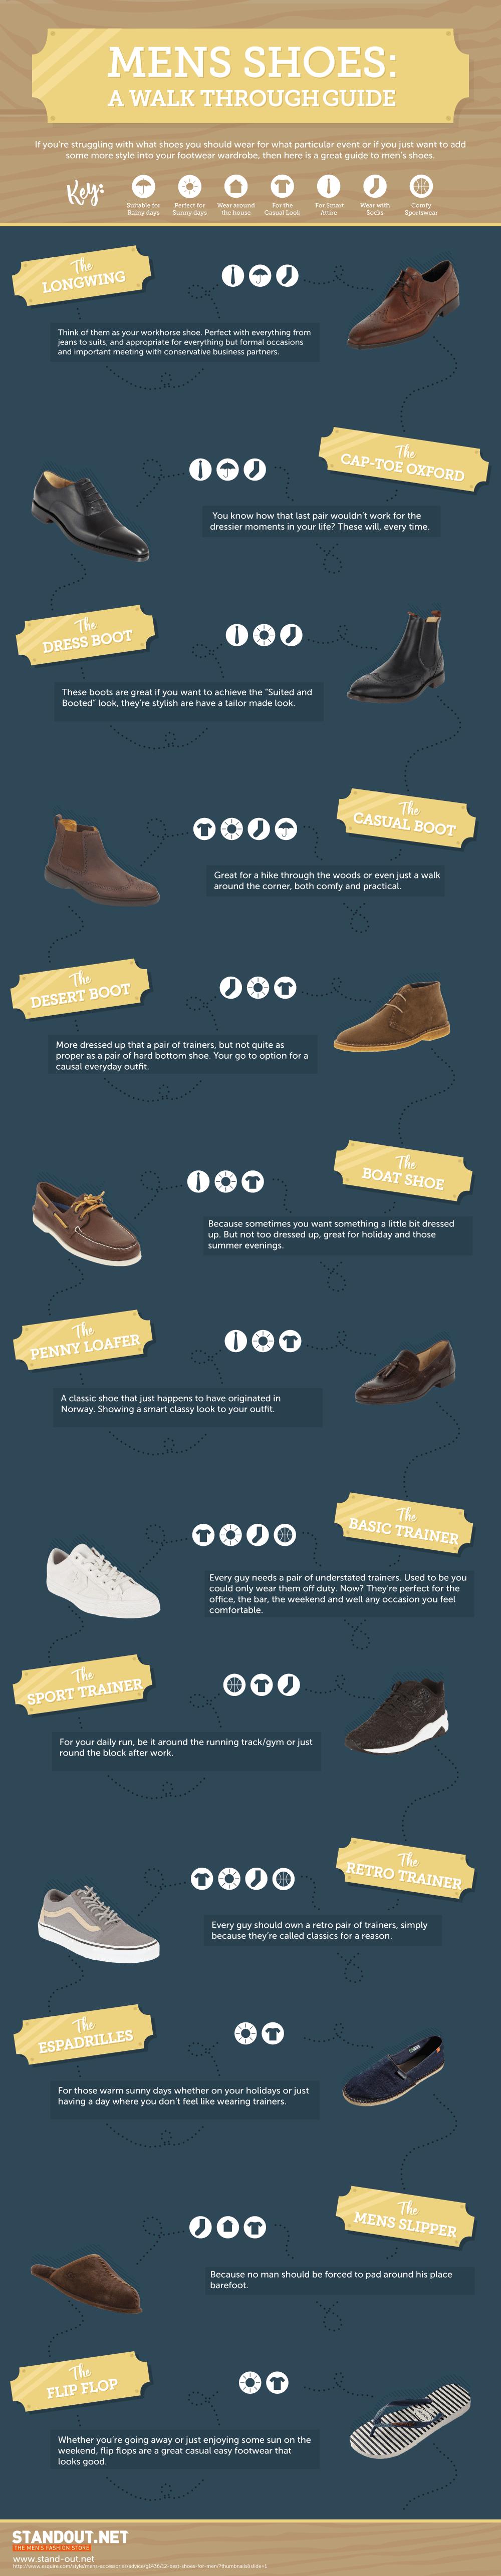 Men's Shoes: A Walk Through Guide